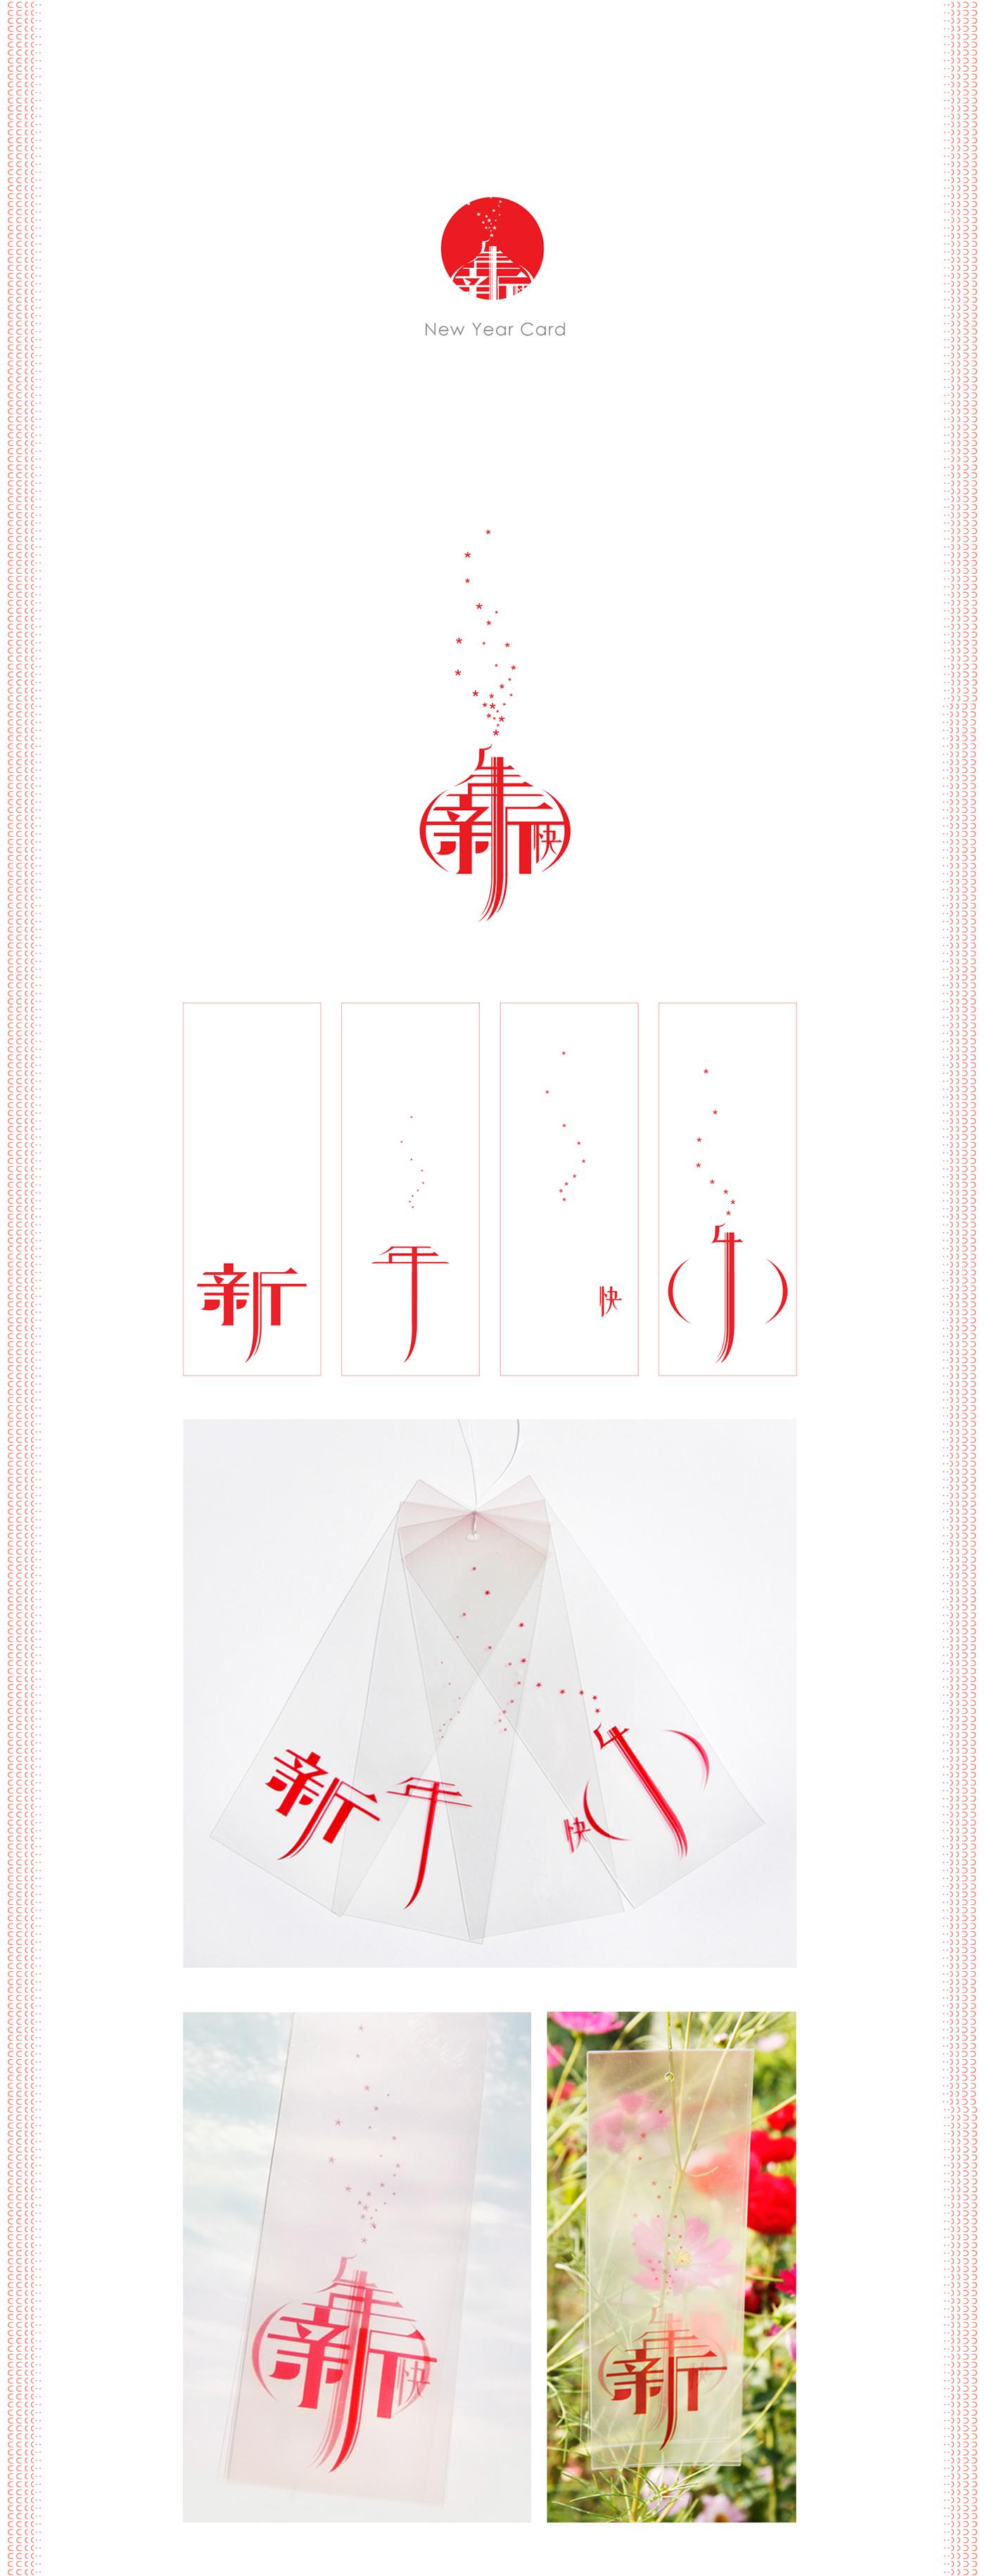 newyear bookmark design print china font card transparent plastic personal Illustrator photoshop Promotion